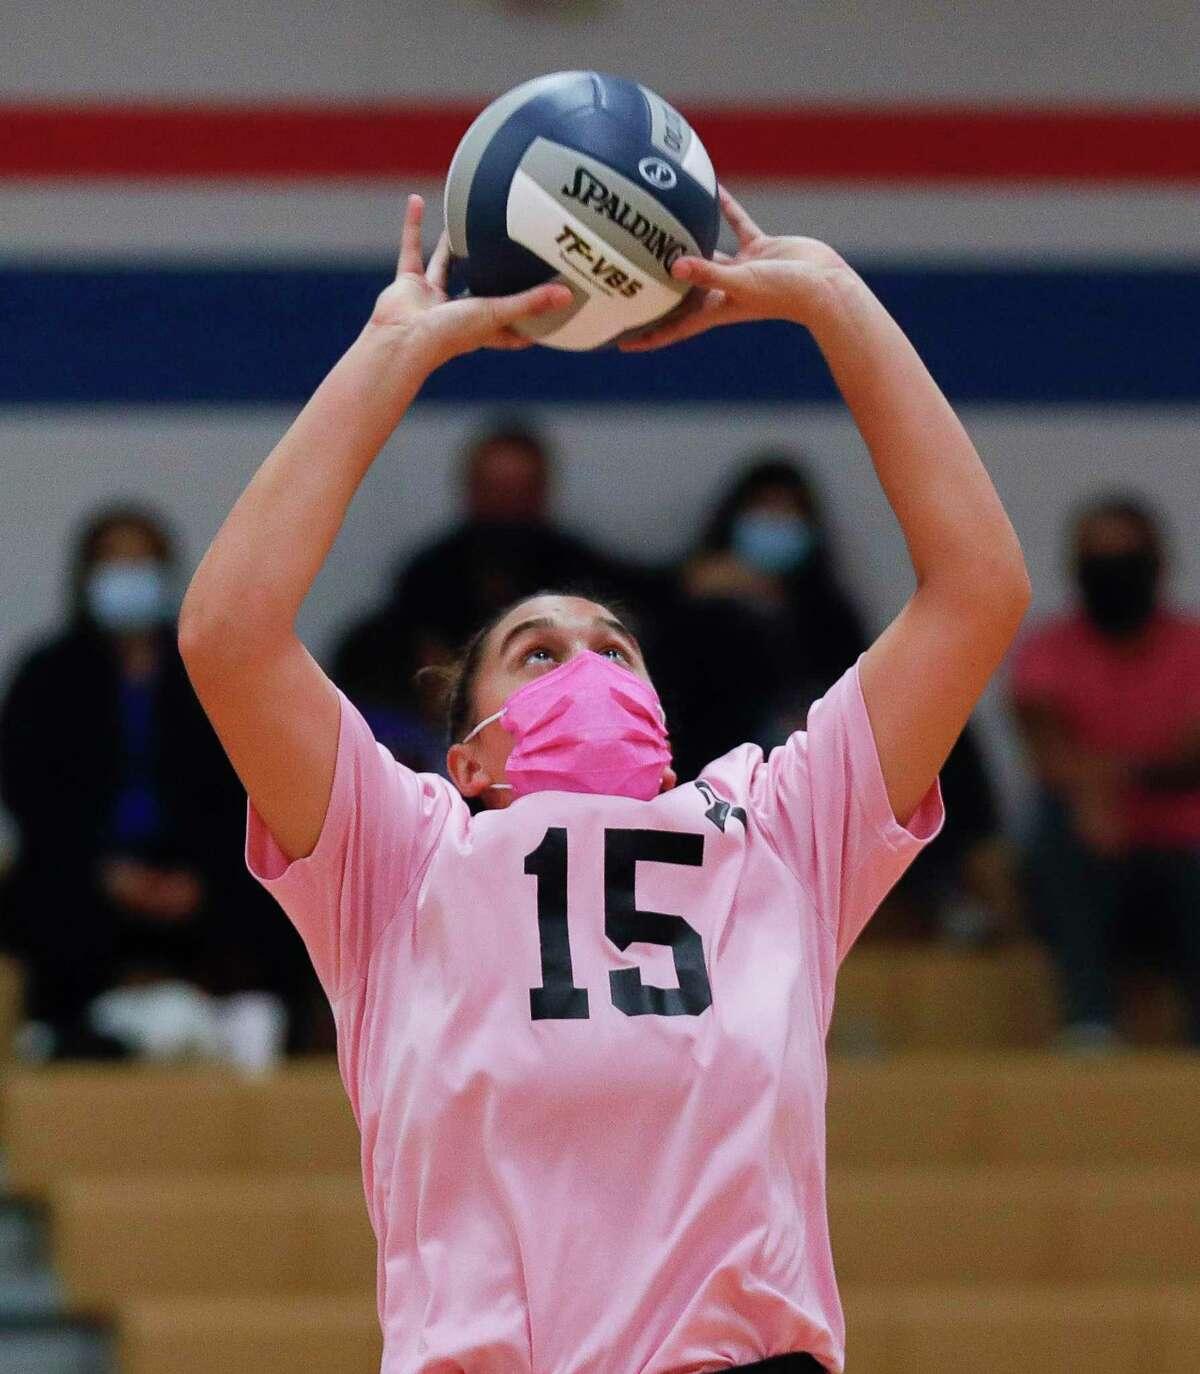 Oak Ridge setter Piper Boydstun (15) sets the ball during the first set of a District 13-6A high school volleyball match at Oak Ridge High School, Friday, Oct. 23, 2020, in Oak Ridge.